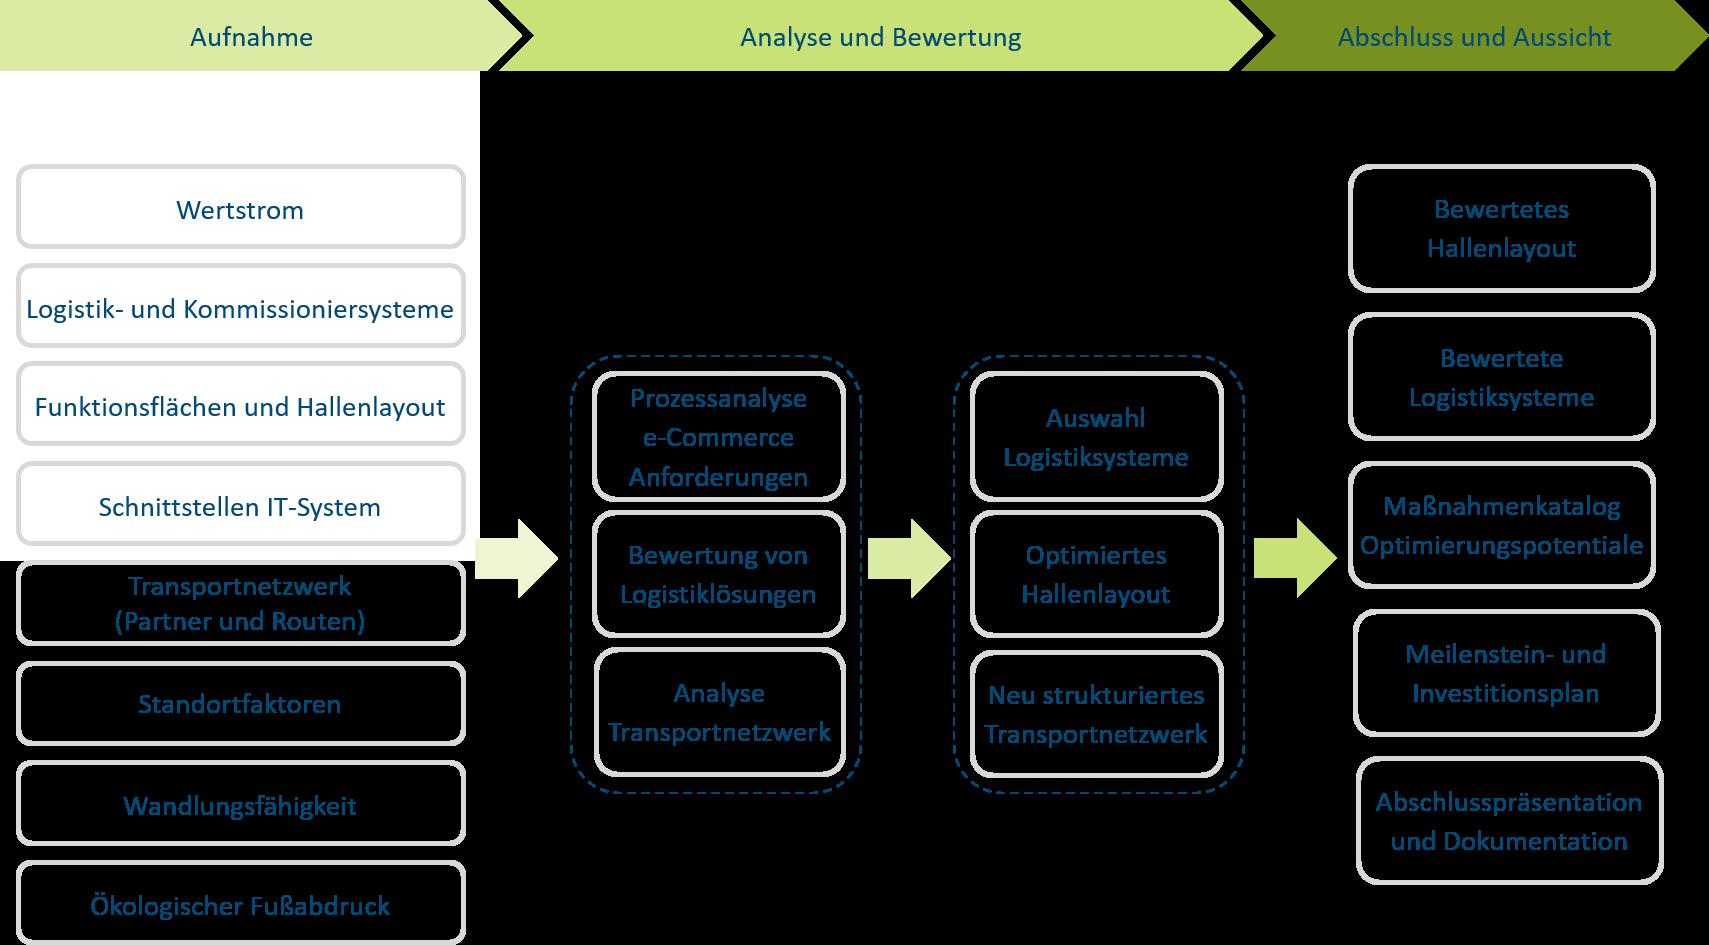 E-Commerce-Prozesse in die betriebliche Logistik integrieren